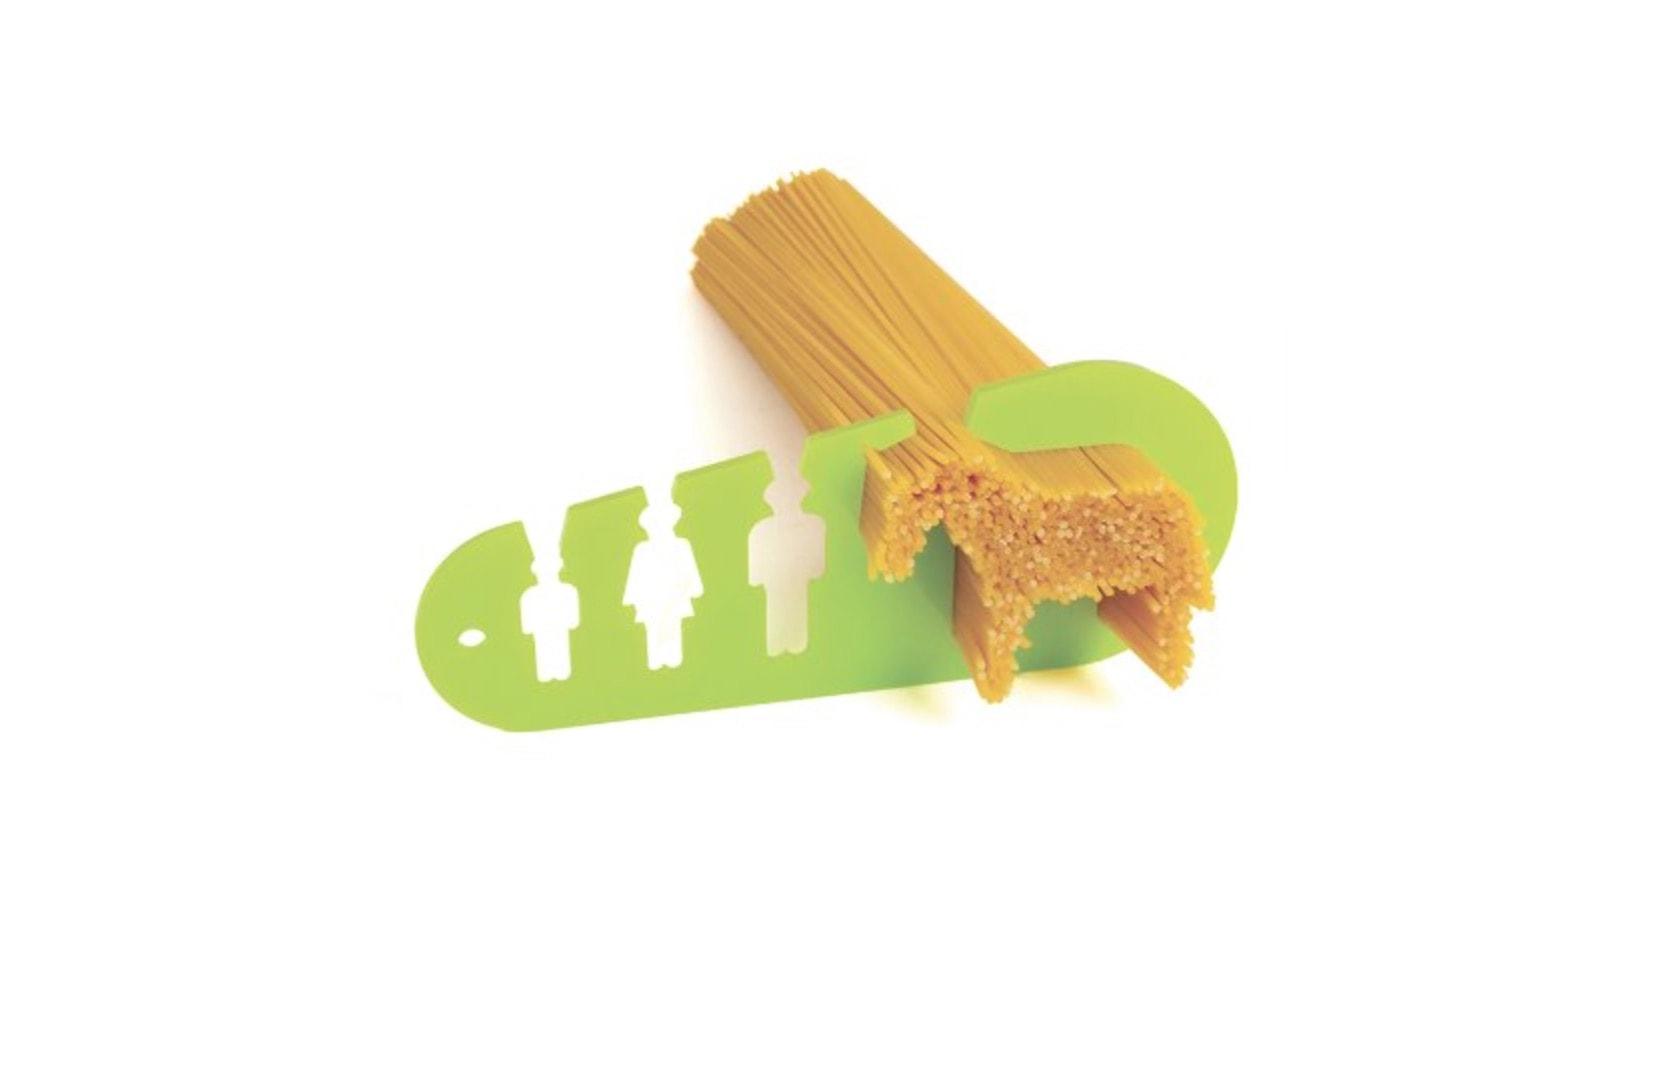 Spaghetti abmessen